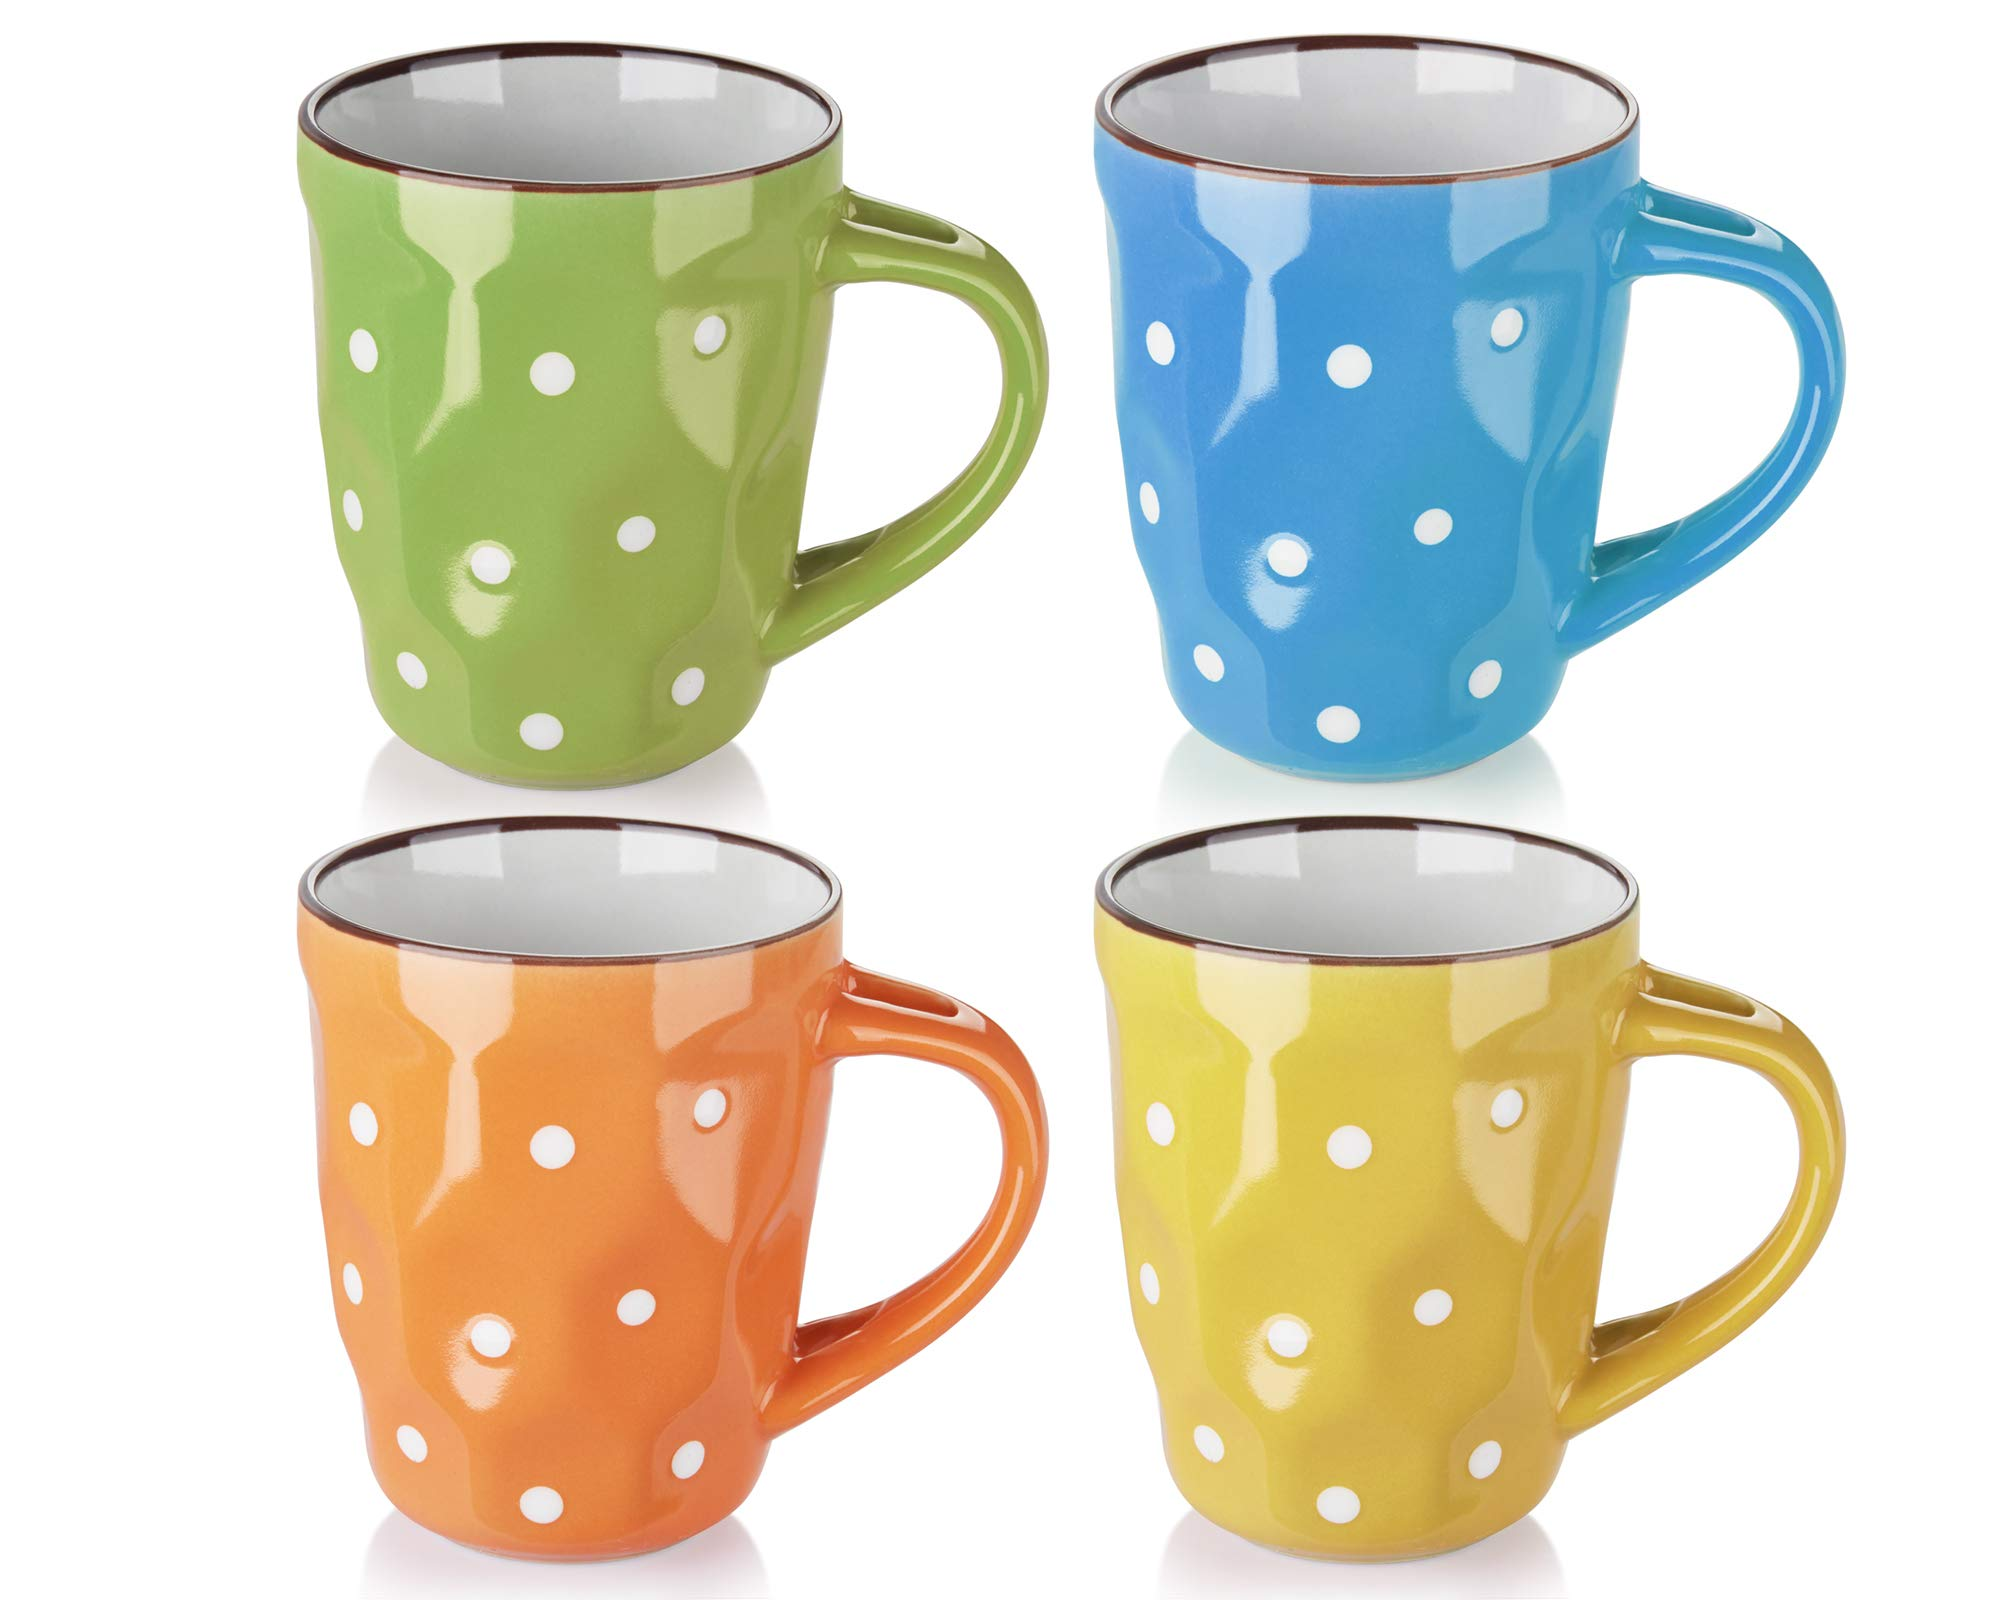 DOWAN Polka Dot Mugs - 13 Ounce for Coffee, Tea, Cocoa,Set of 4, Porcelain mugs, Assorted Colors